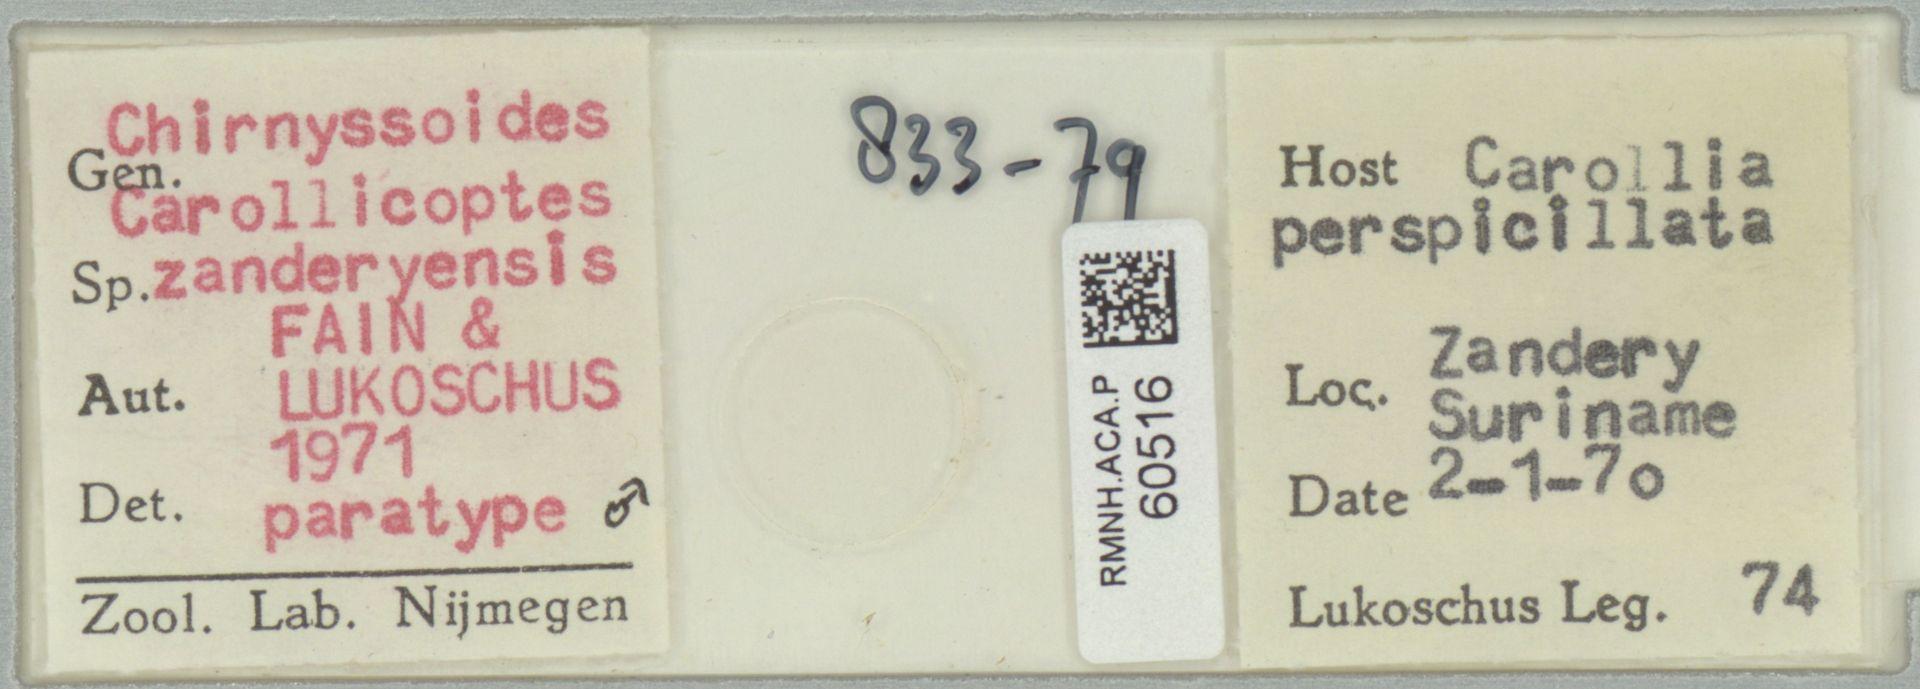 RMNH.ACA.P.60516 | Chirnyssoides (Carollicoptes) zanderyensis Fain & Lukoschus 1971